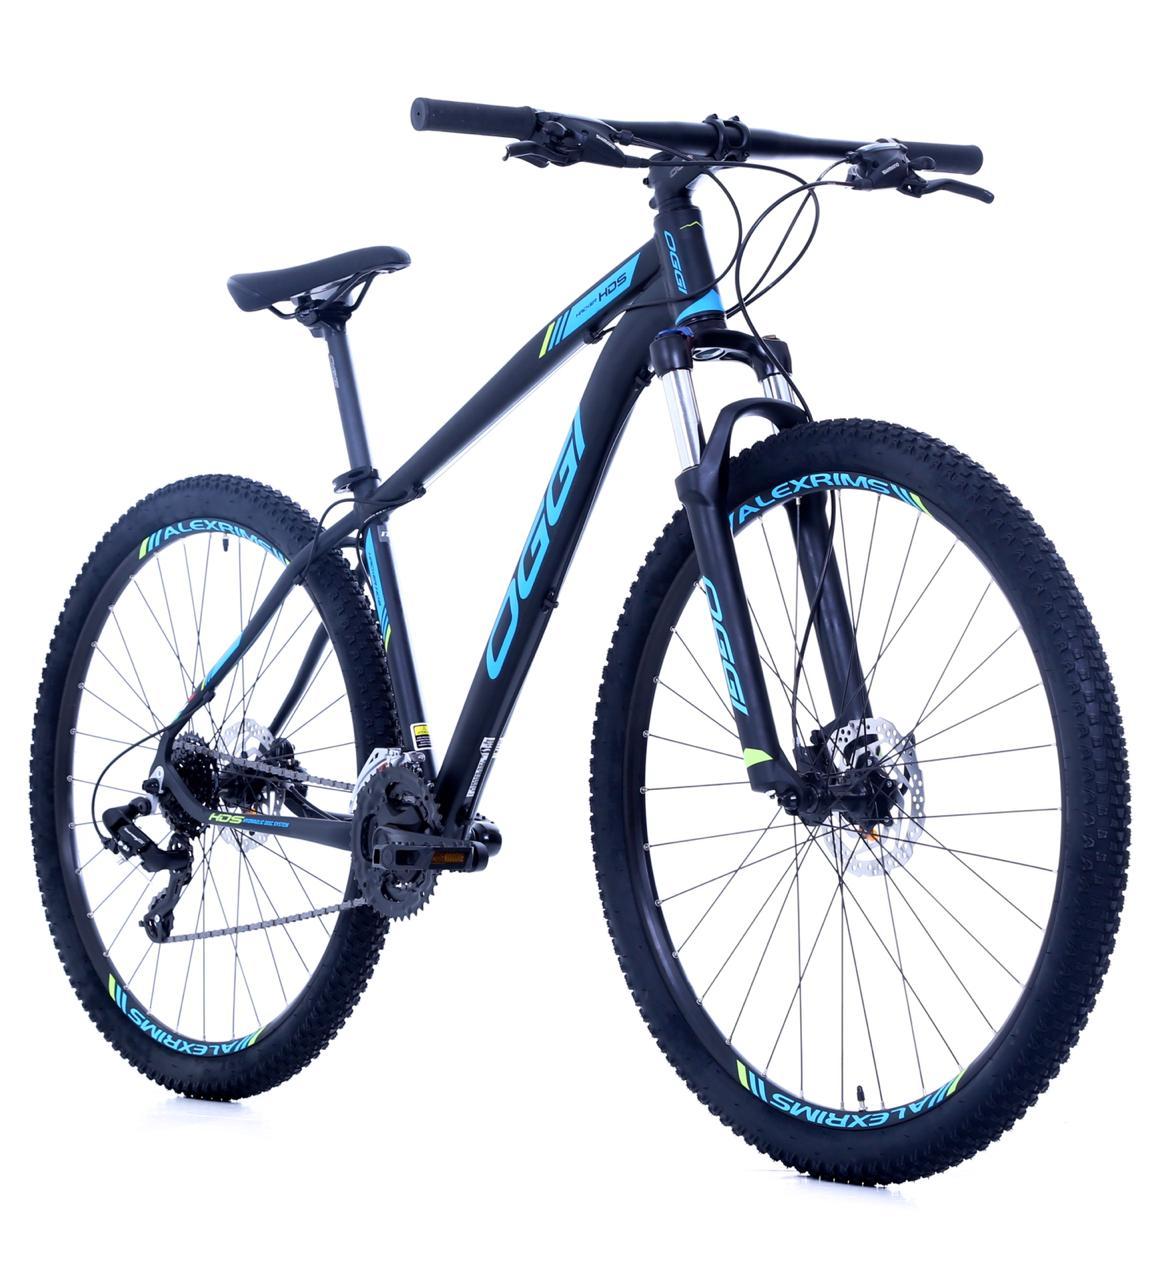 Bicicleta Oggi - Hacker HDS 24v - Preto / Azul / Verde Neon + Brinde